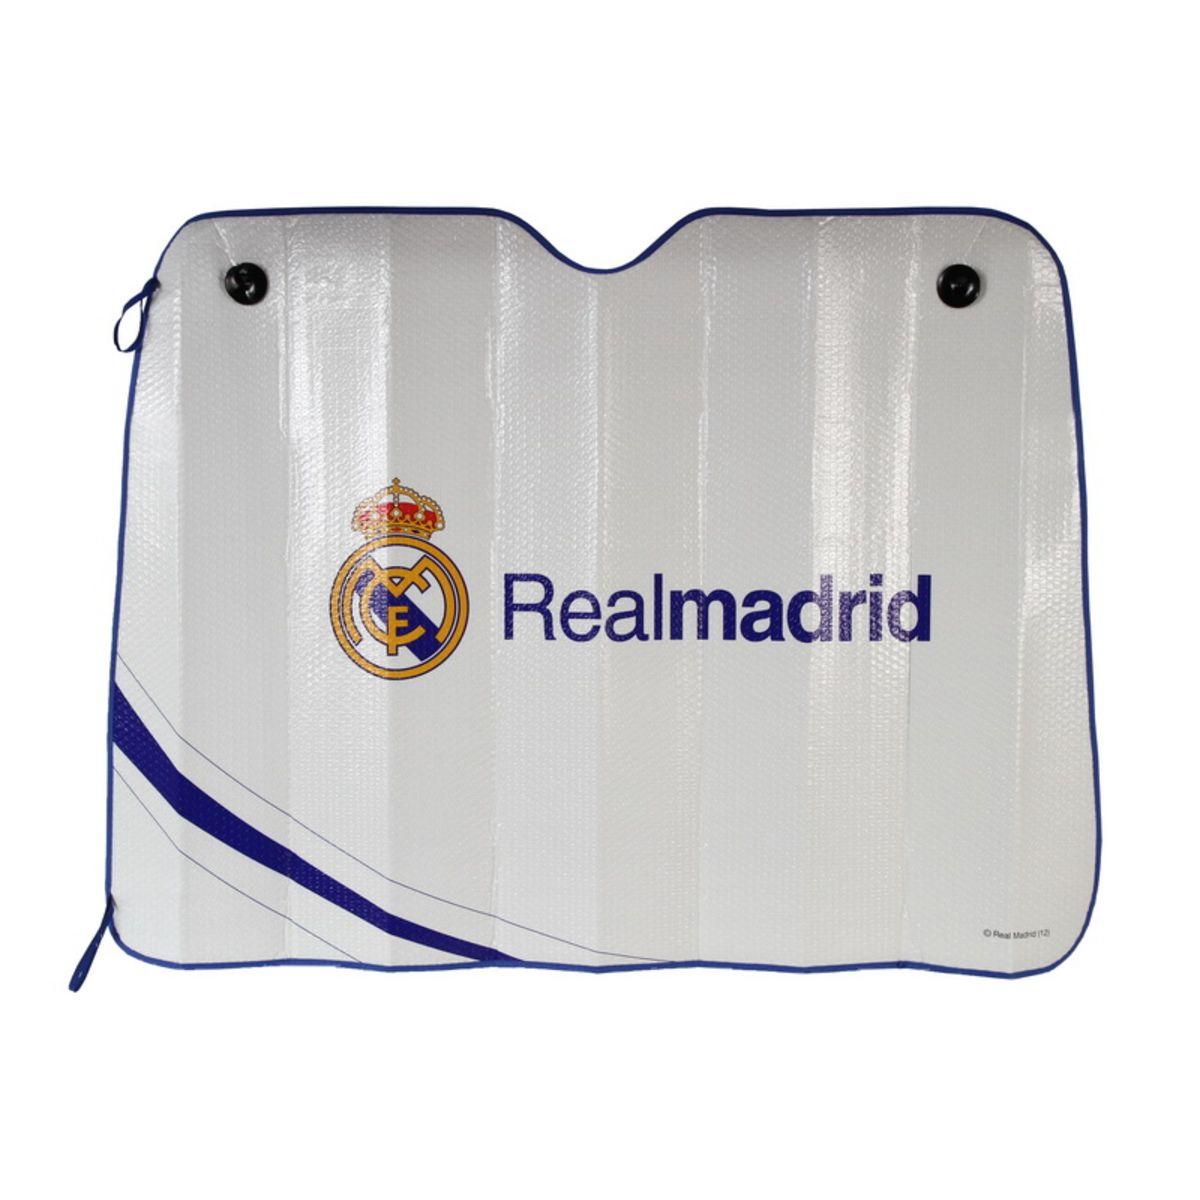 e3b66990b2 MAMMOOTH Sluneční clona 1450 x 1000 mm Real Madrid XXL